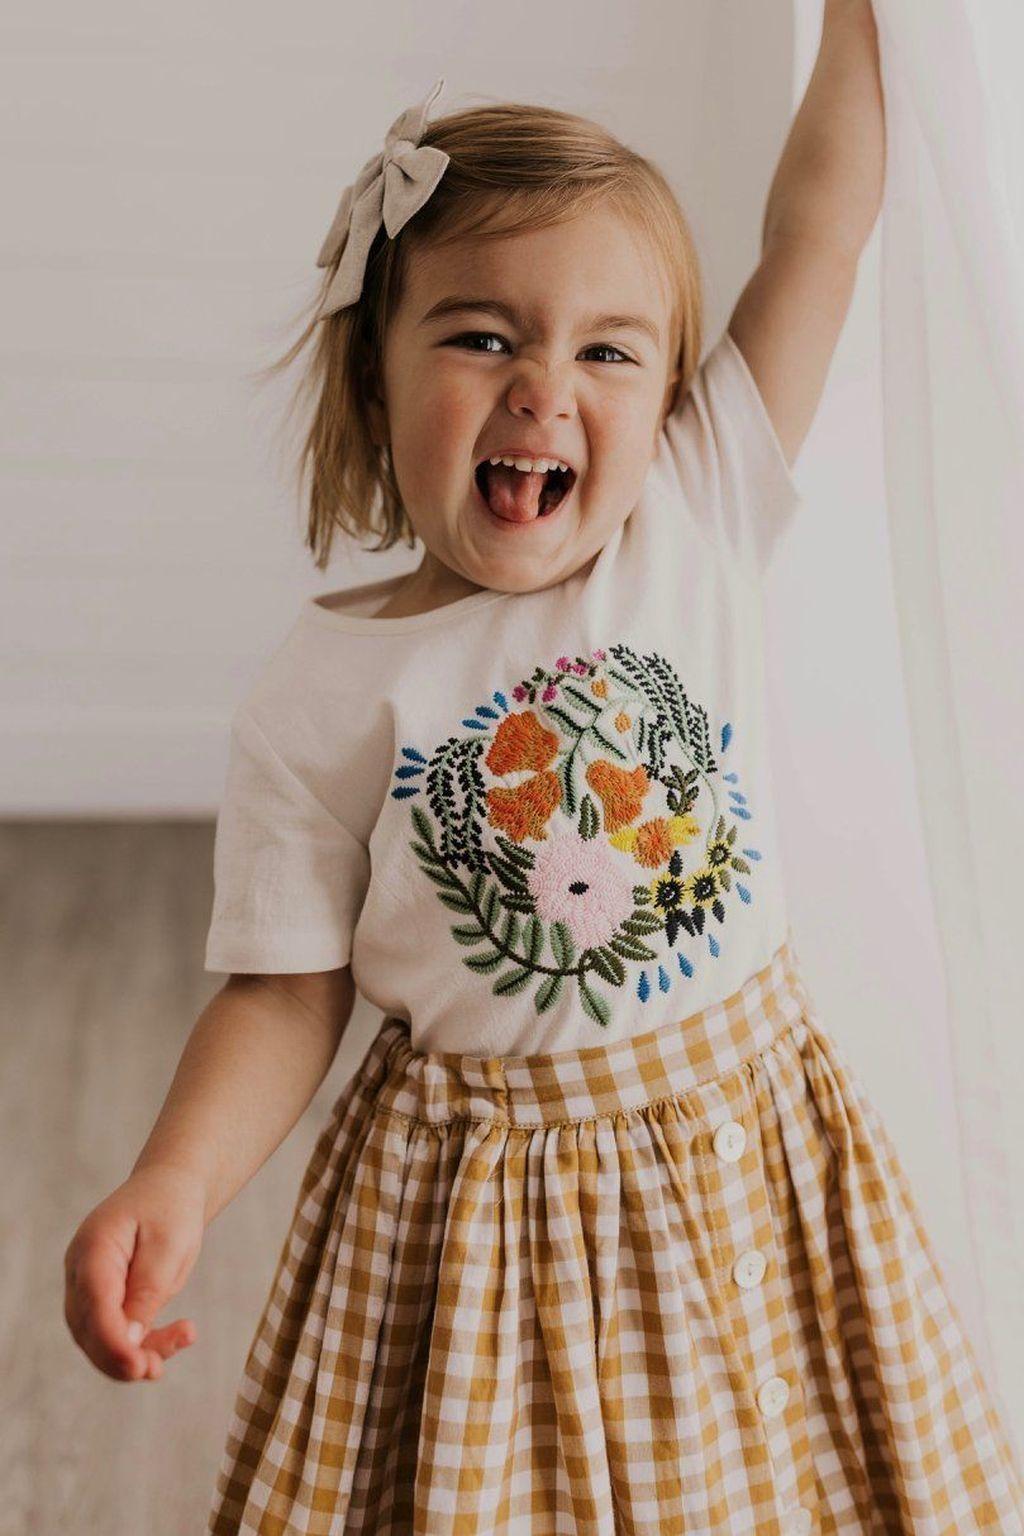 48 Cute Kids Summer Fashion Ideas Kids Summer Fashion Kids Outfits Little Girl Fashion [ 1536 x 1024 Pixel ]